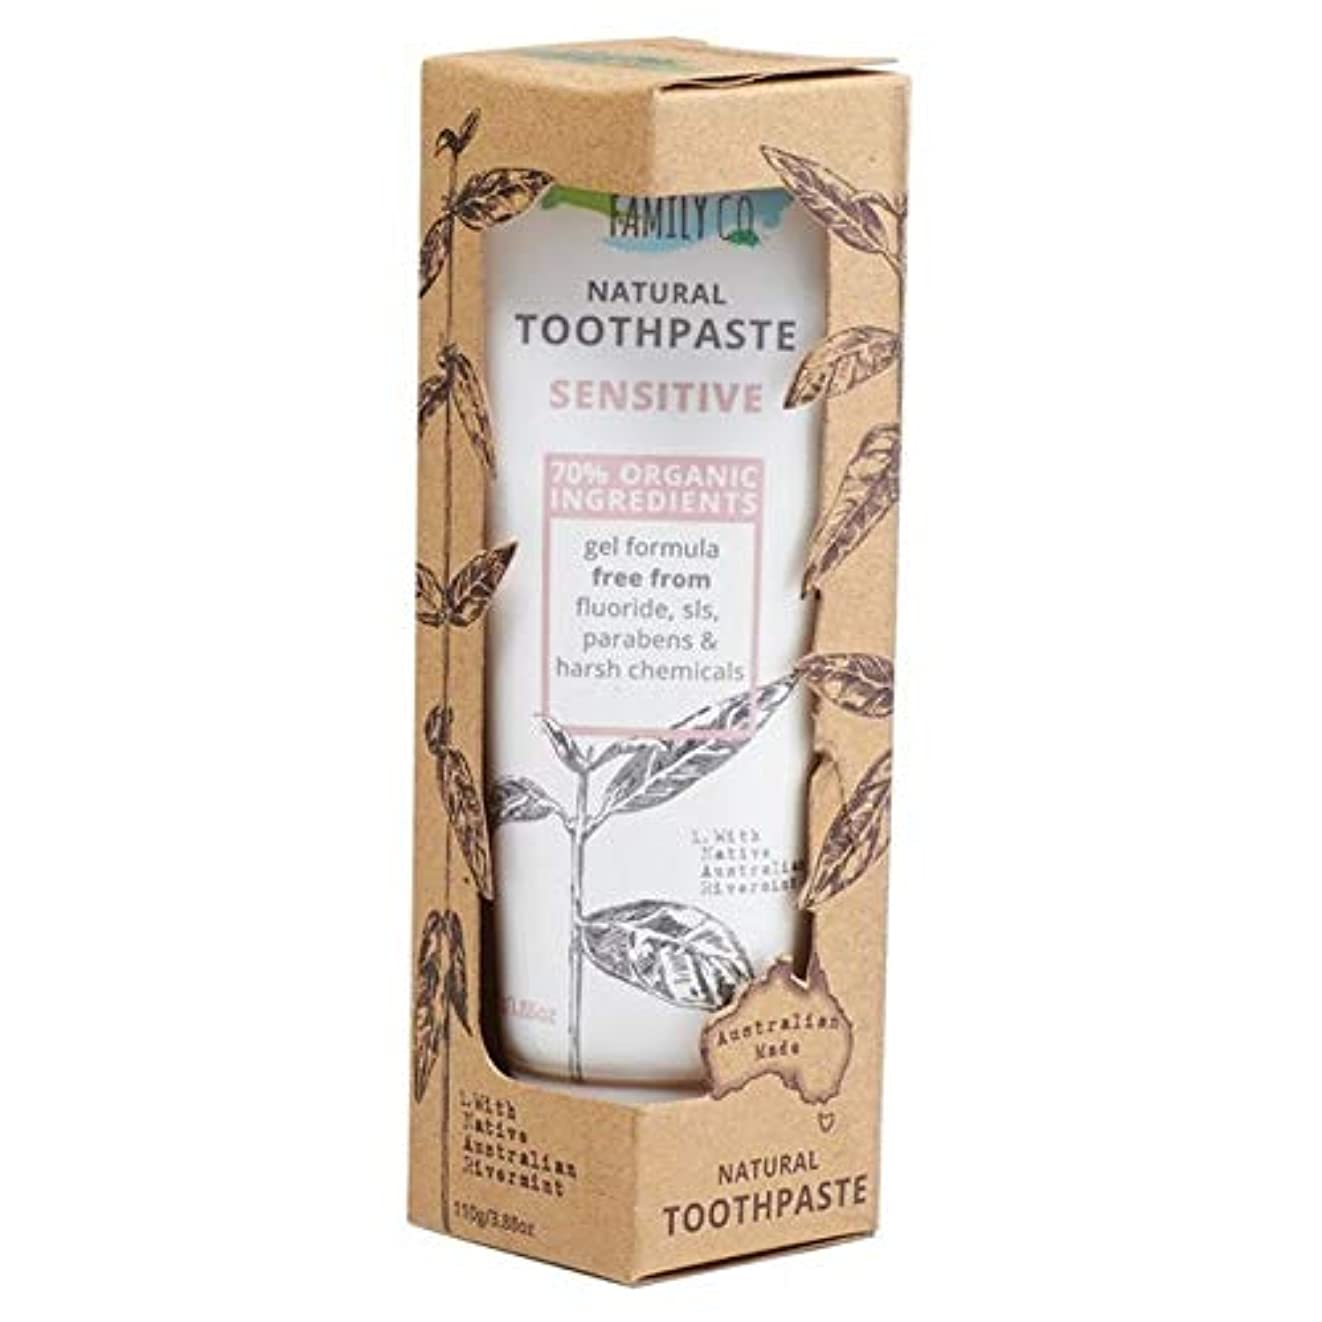 [Natural Family ] 自然な家族に敏感な歯磨き粉の110グラム - Natural Family Sensitive Toothpaste 110g [並行輸入品]